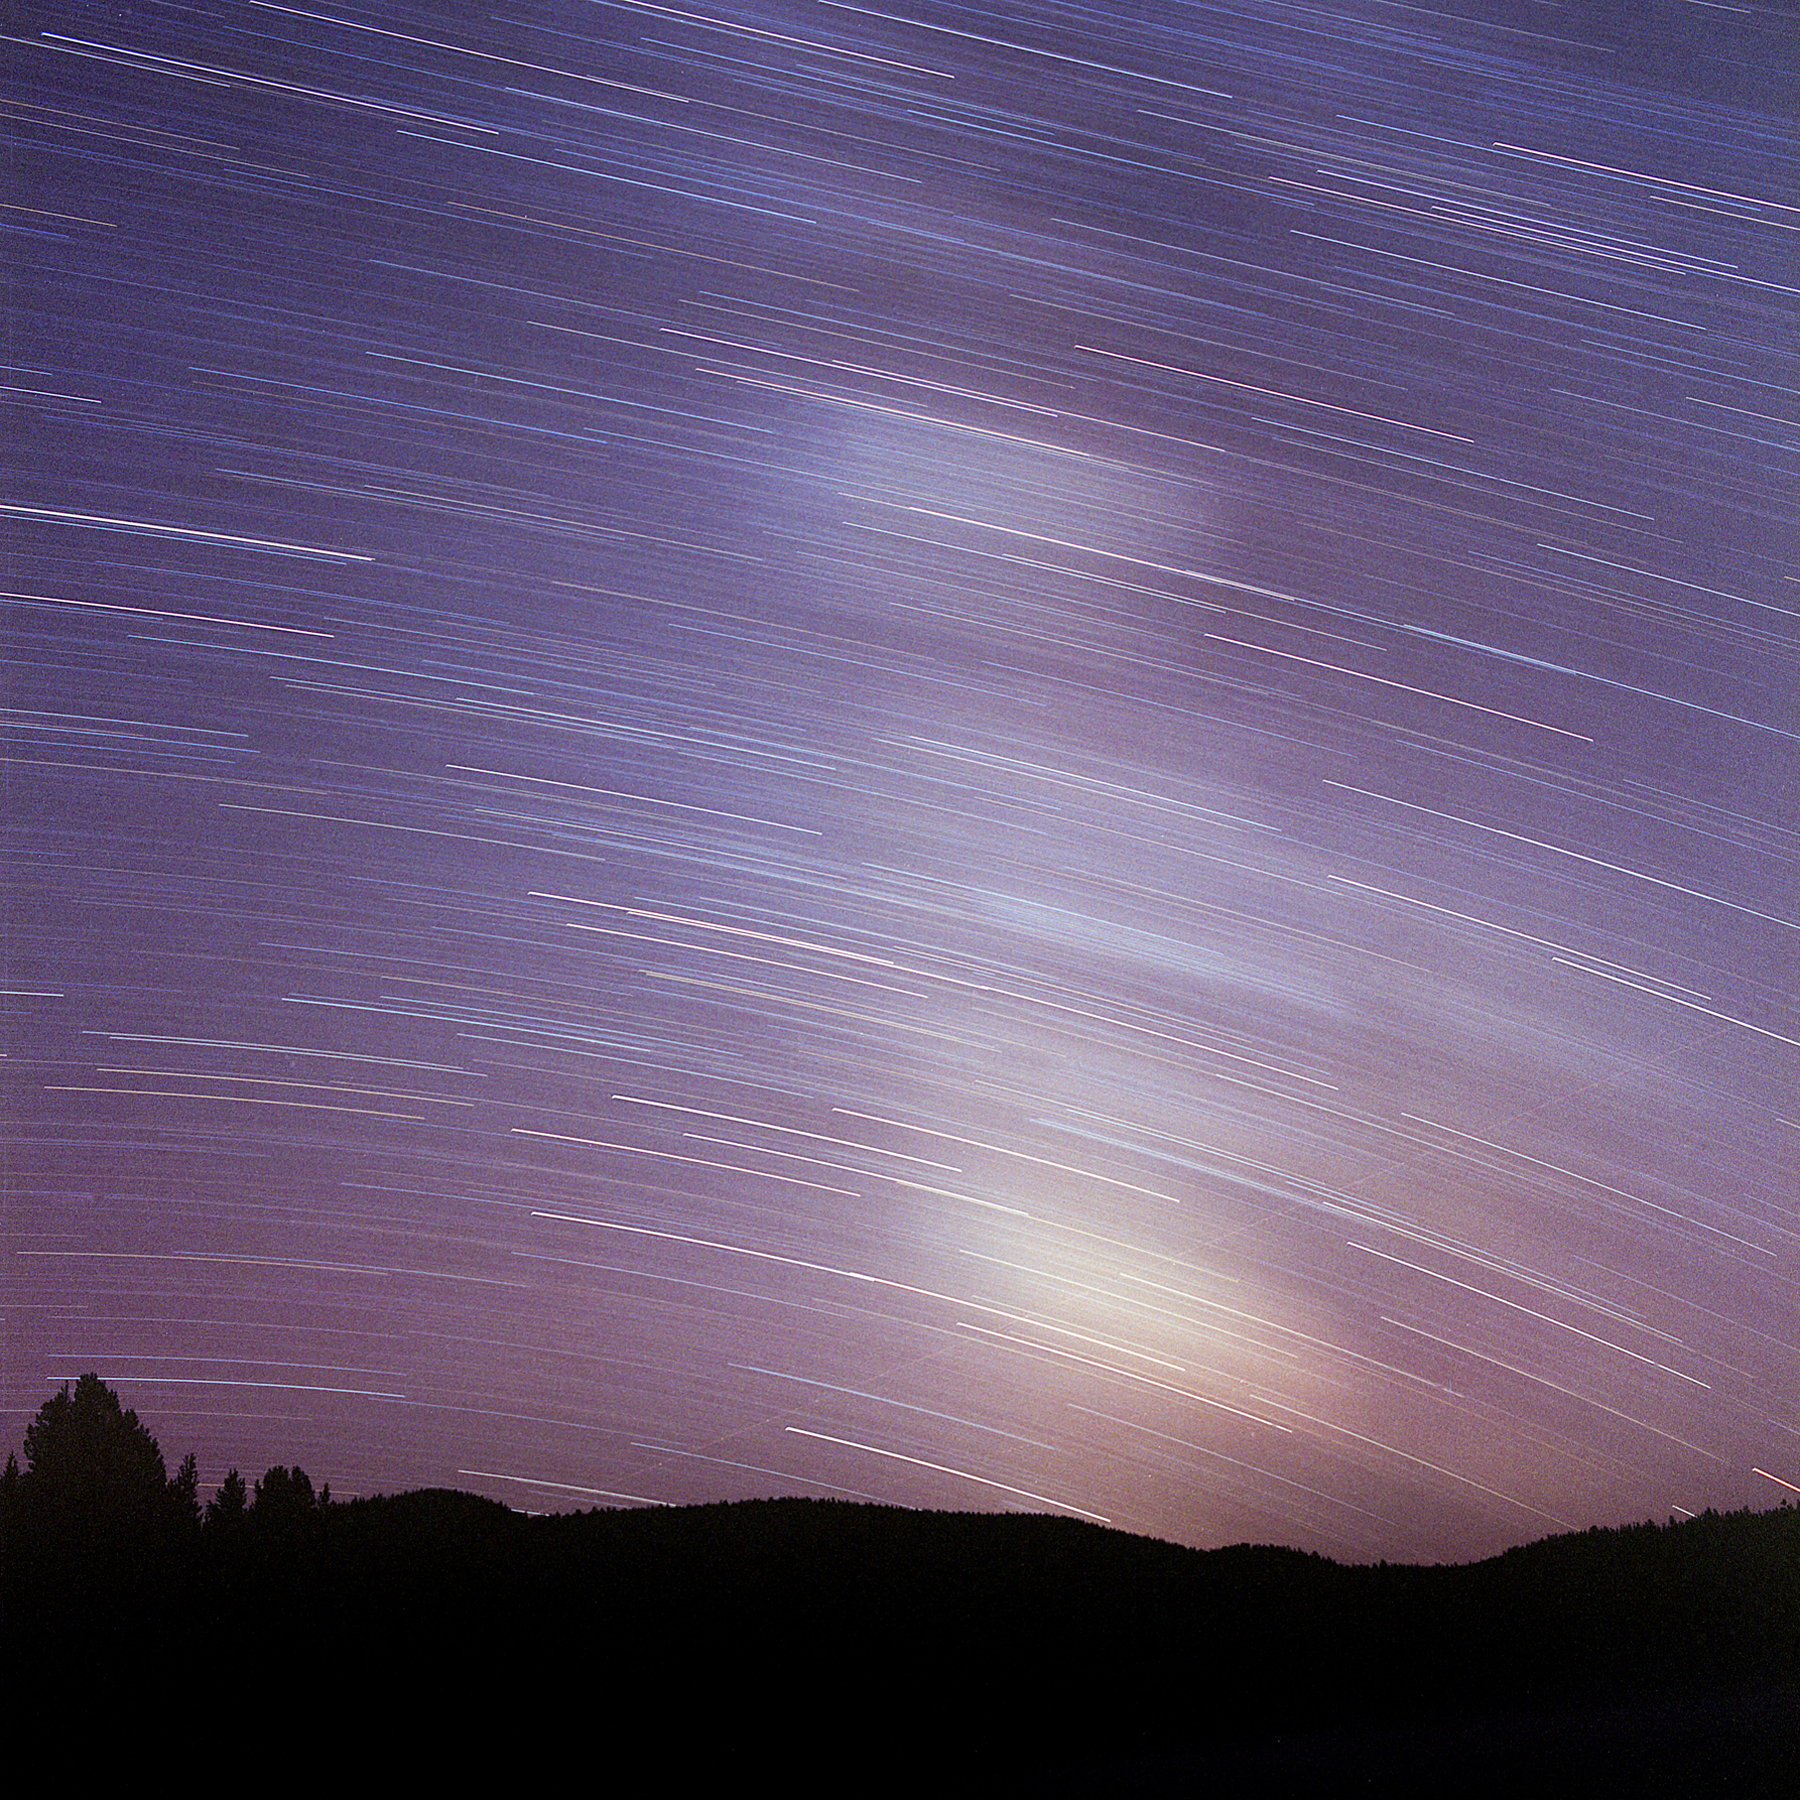 Milky | Hasselblad 500 C/M | 60mm CT - Fuji 160NS | Aaron Bieleck